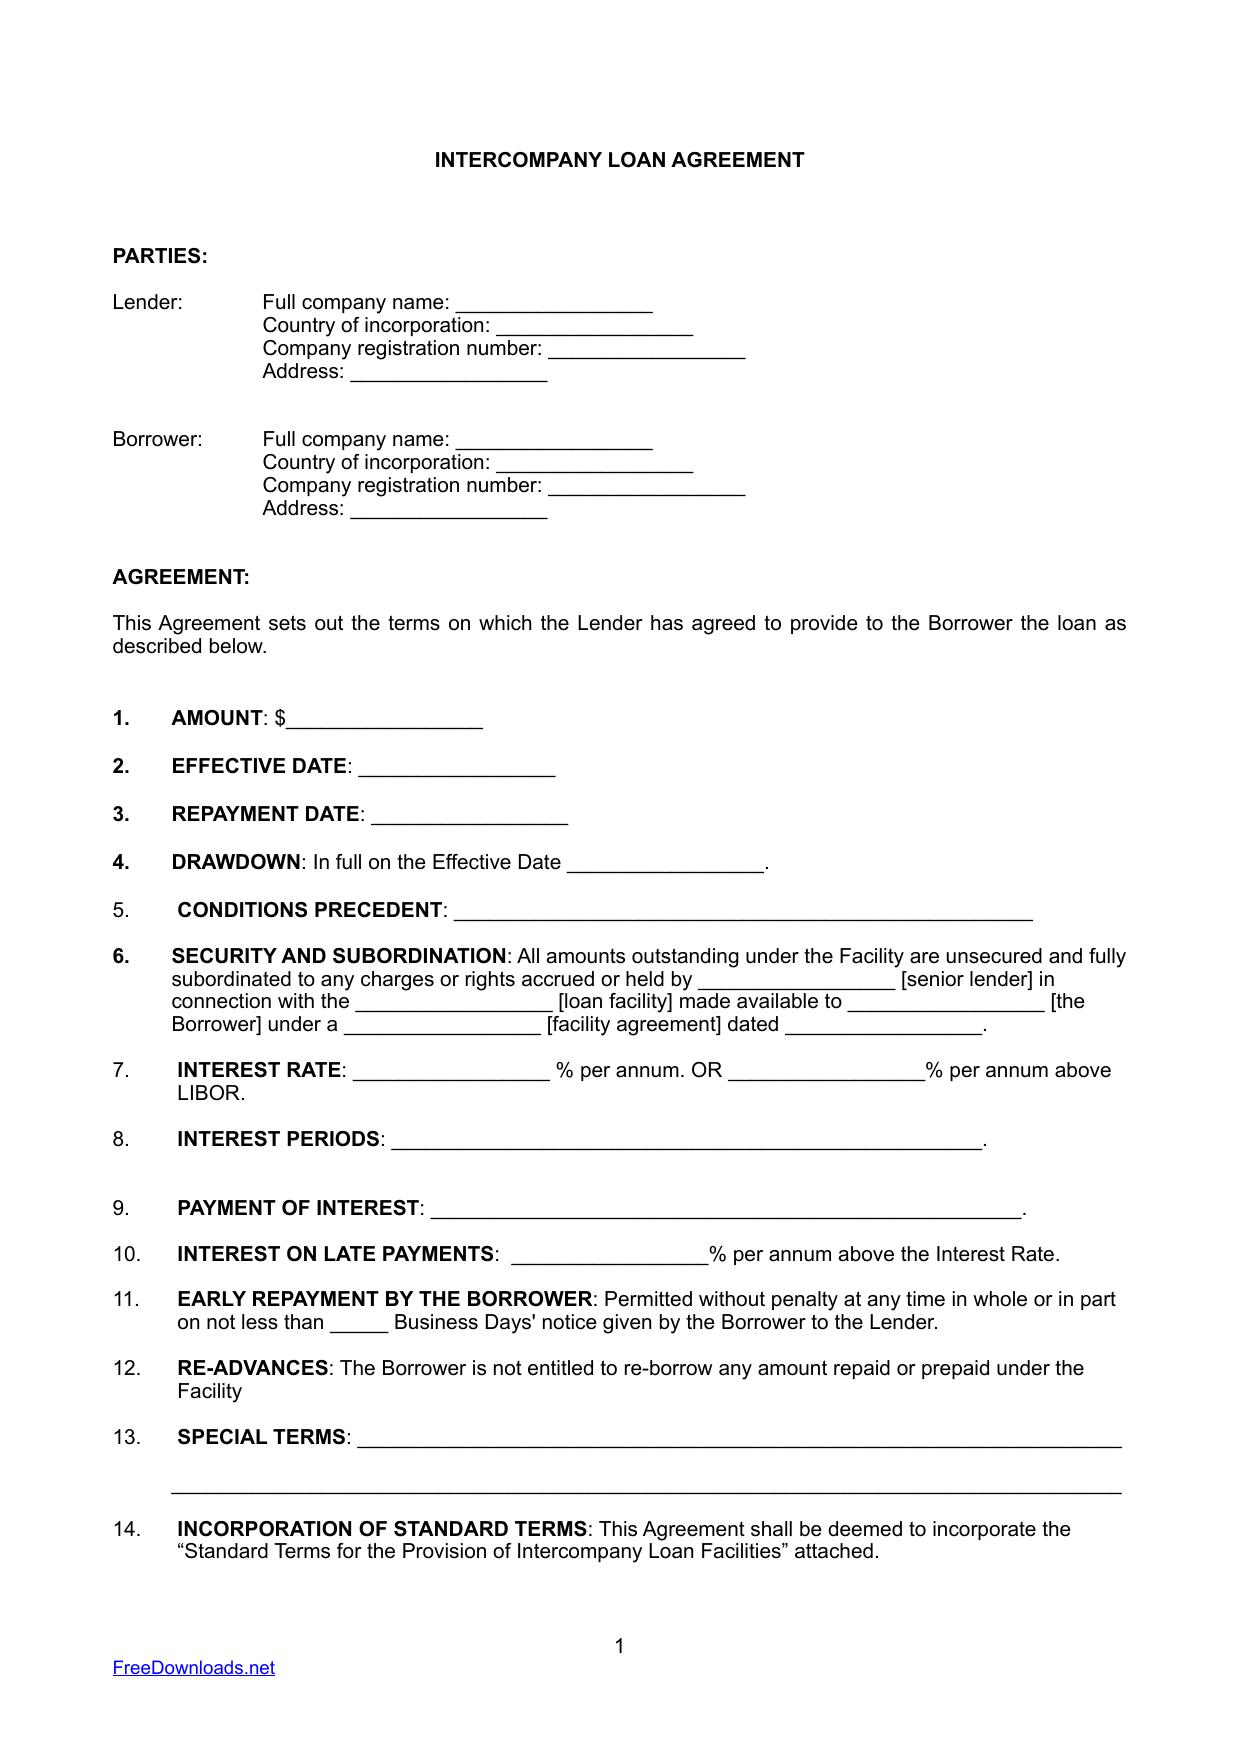 Download InterCompany Loan Agreement Template PDF RTF Word